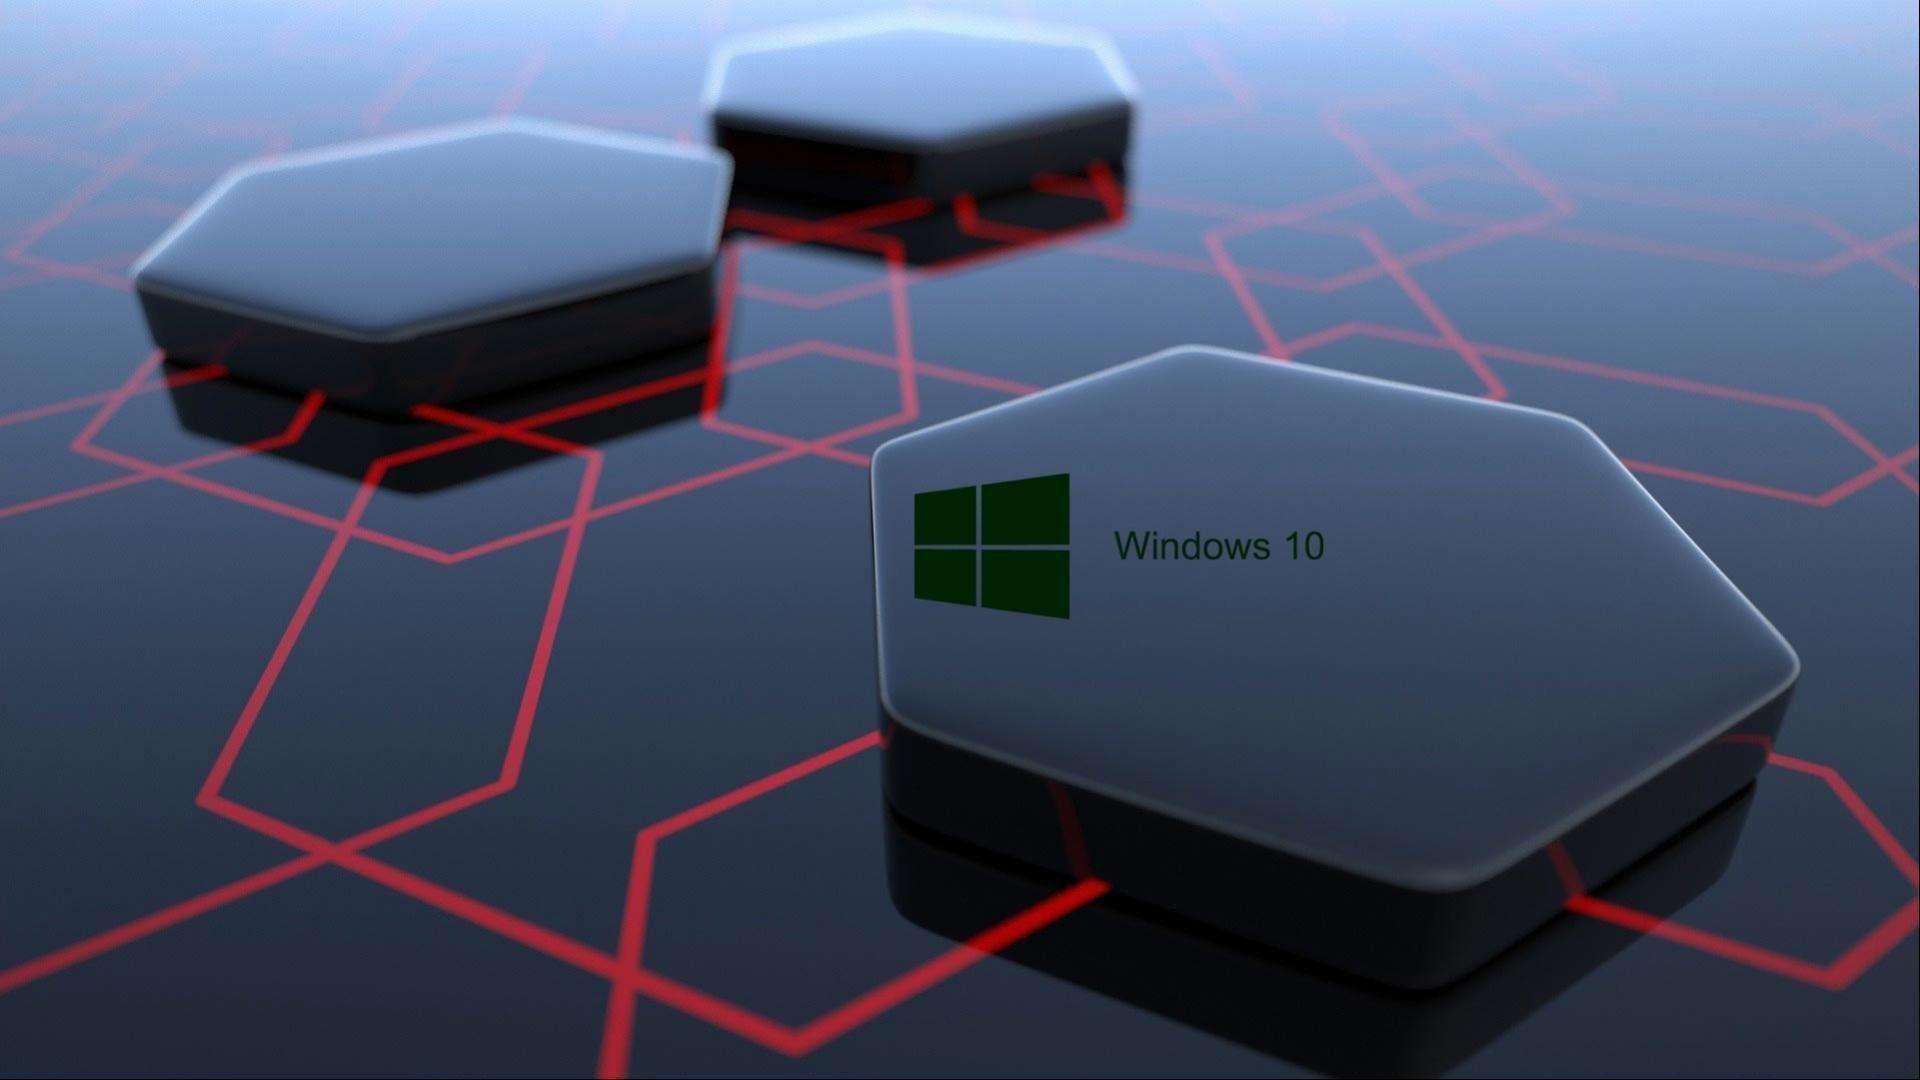 1920x1080 Windows 10 Wallpaper Hd 3d For Desktop Black Wallpaper Windows 10 3d Wallpaper For Laptop Windows Wallpaper